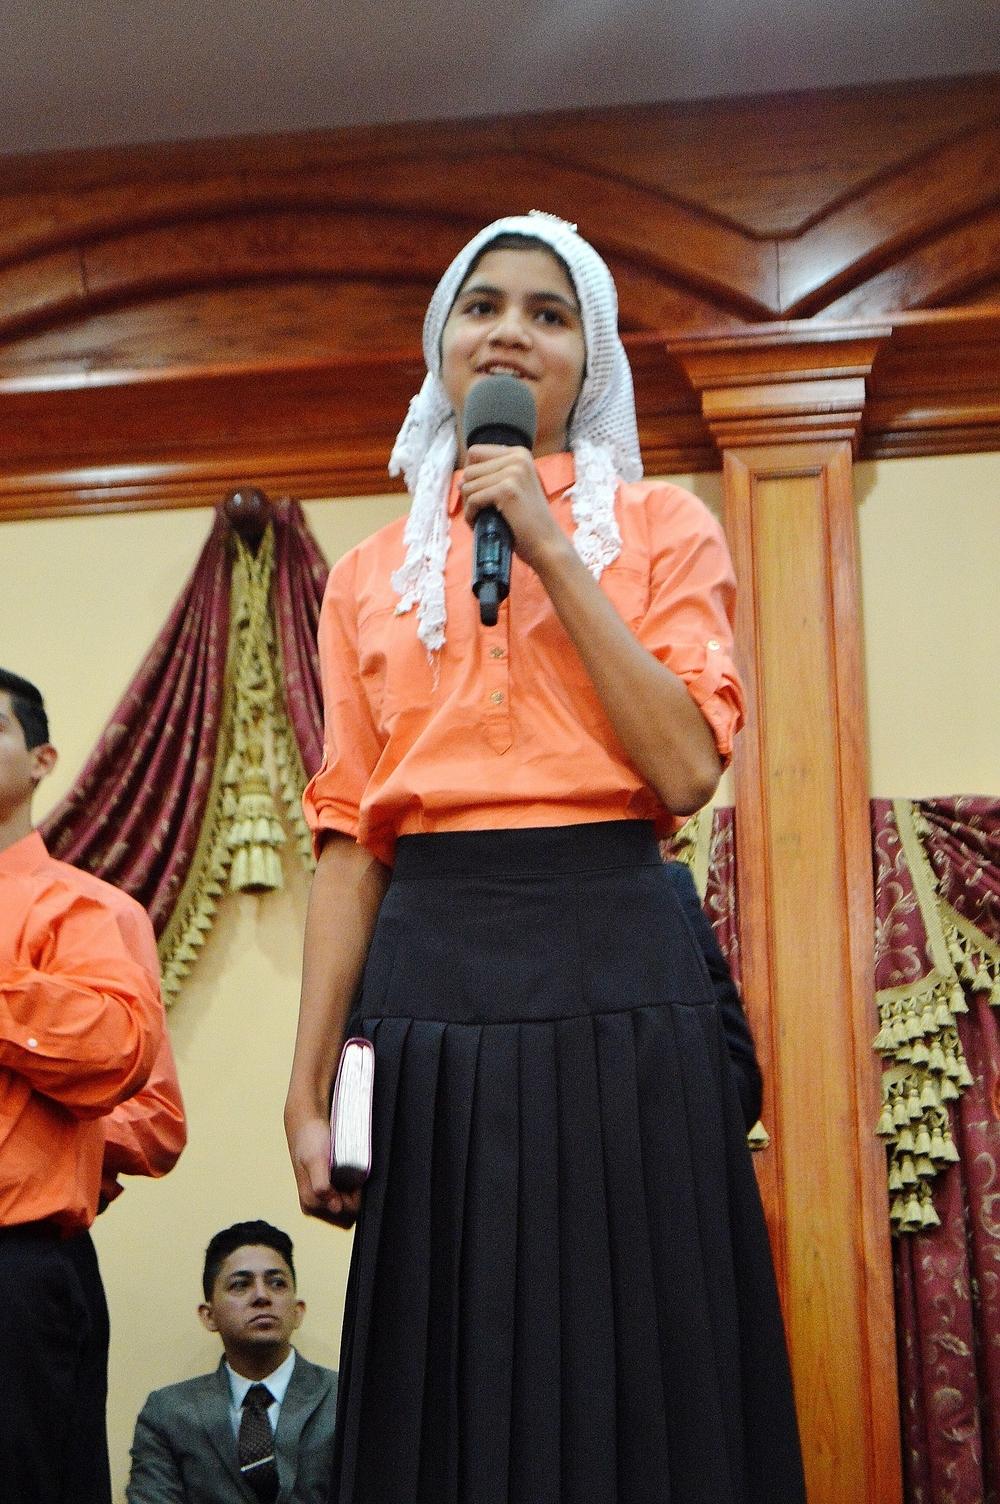 DSC_0042 20115.JPG